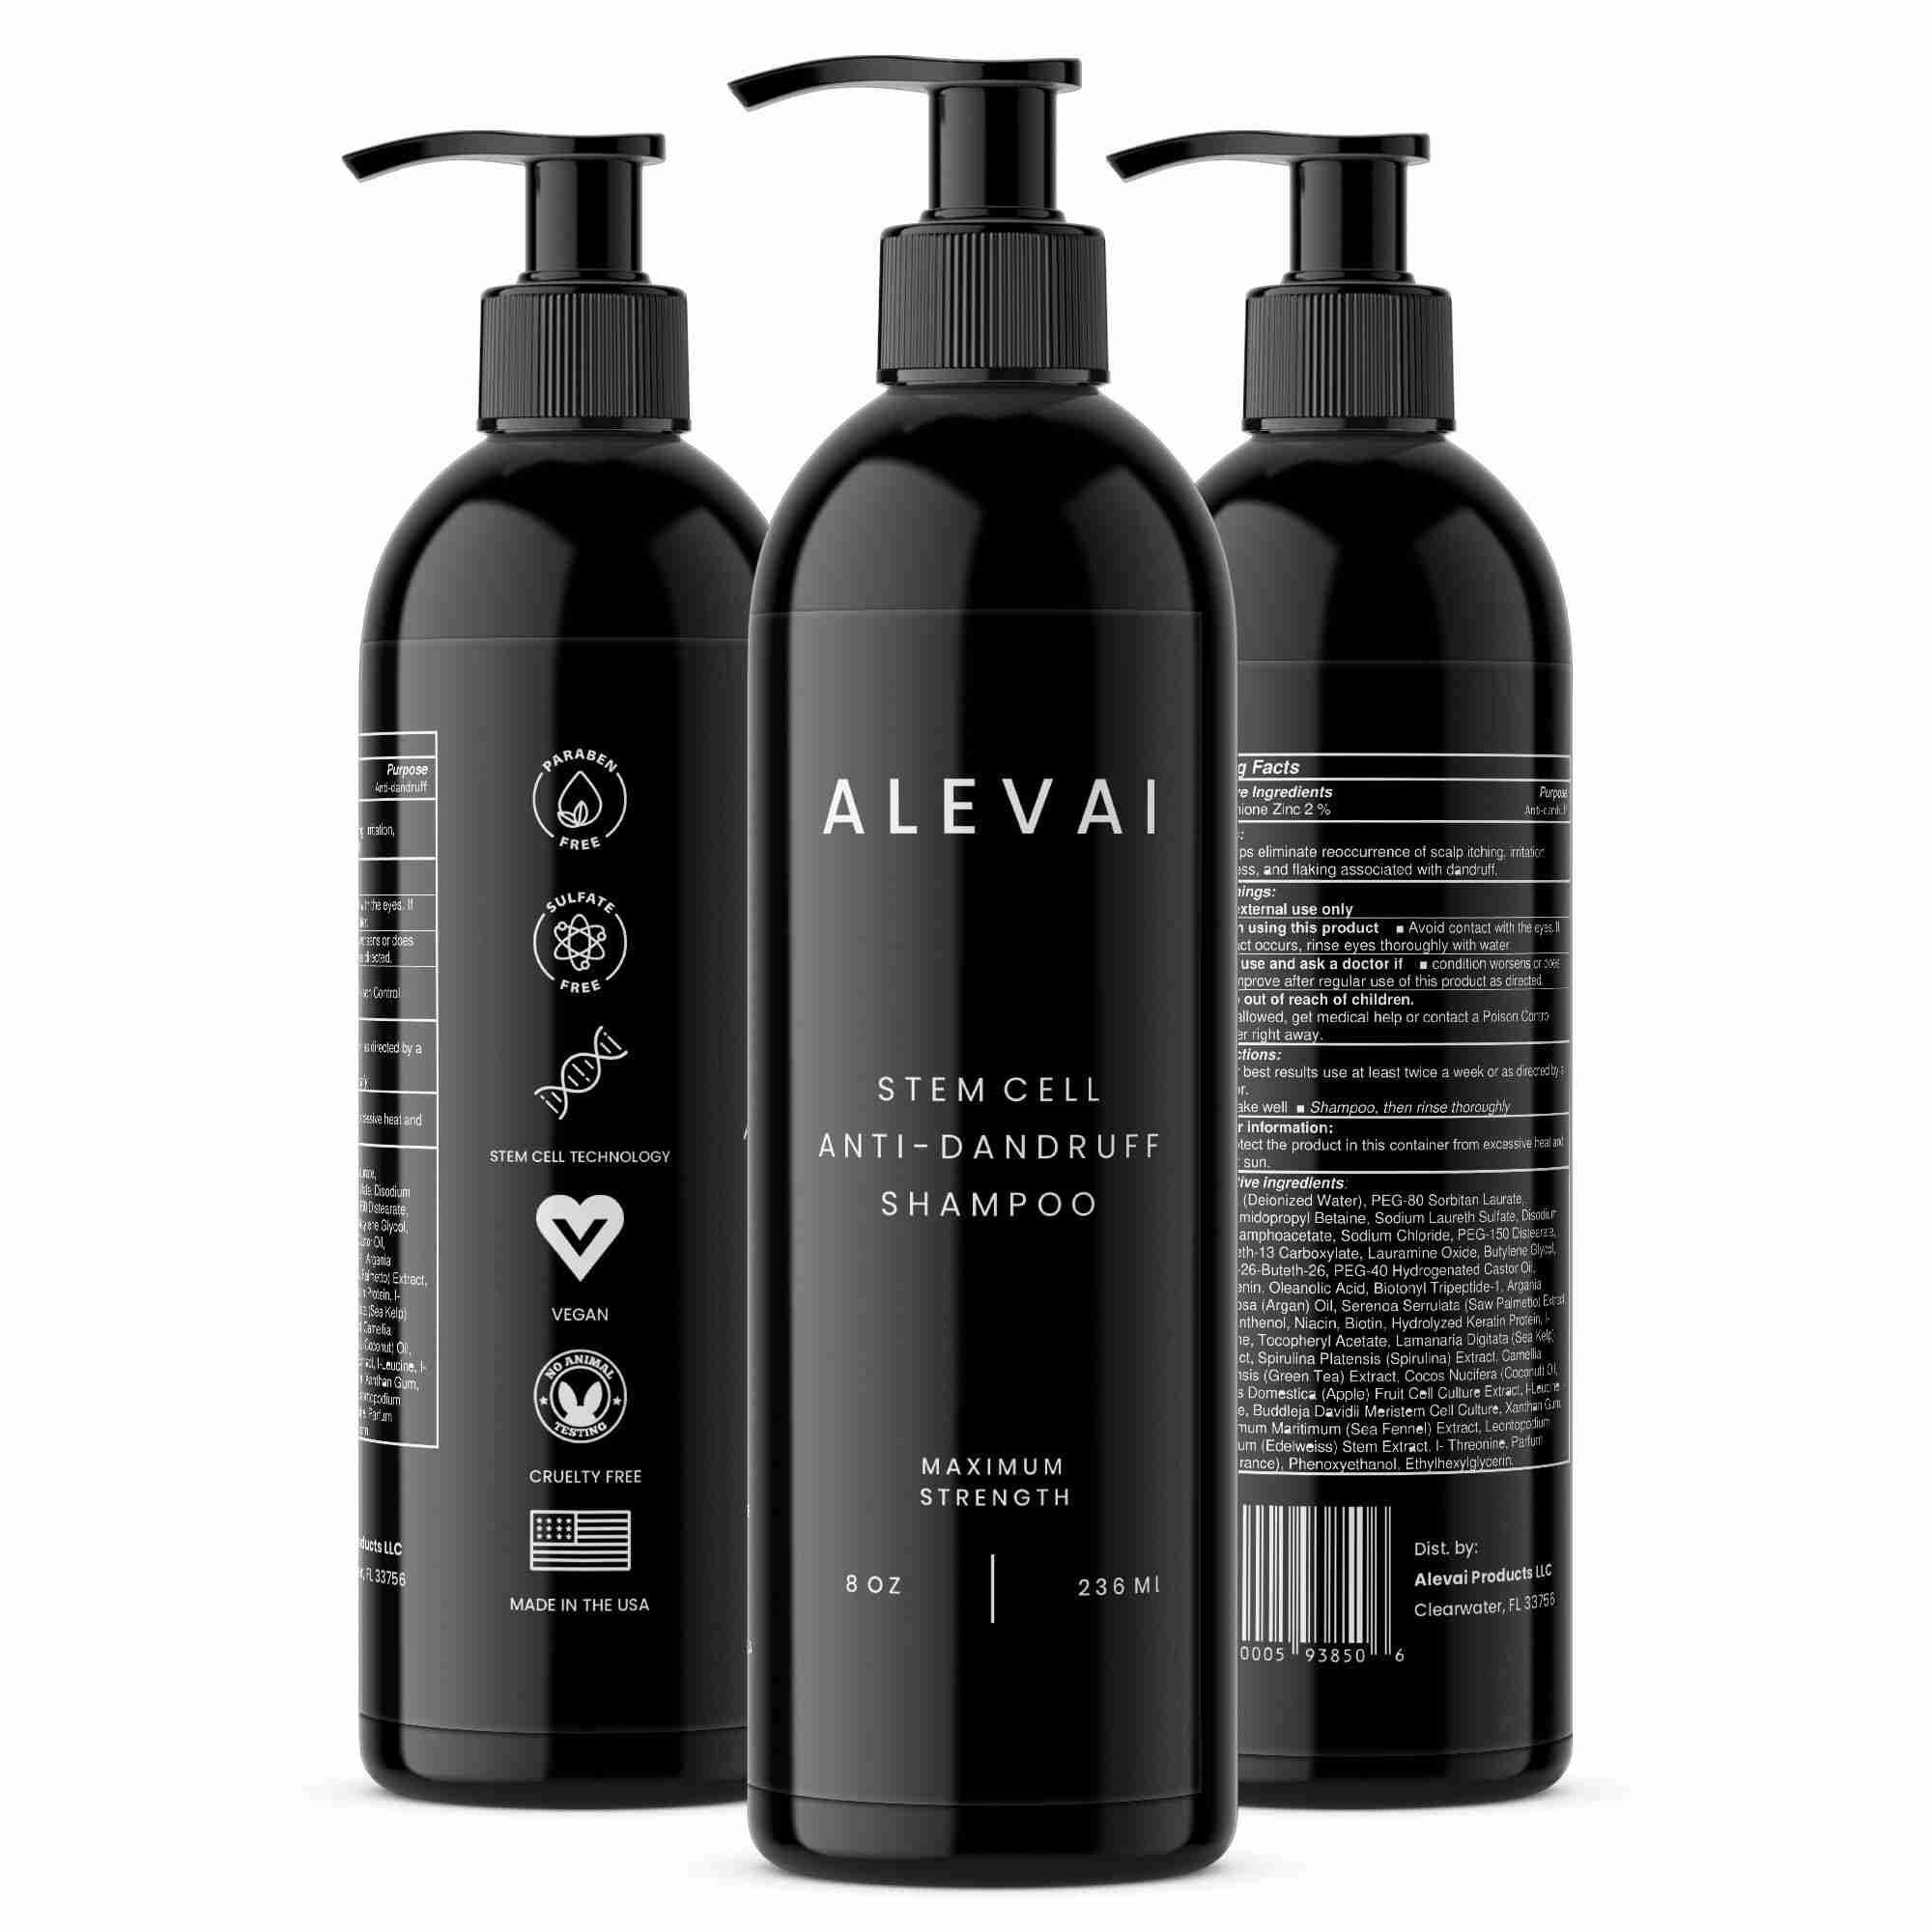 shampoo with cash back rebate